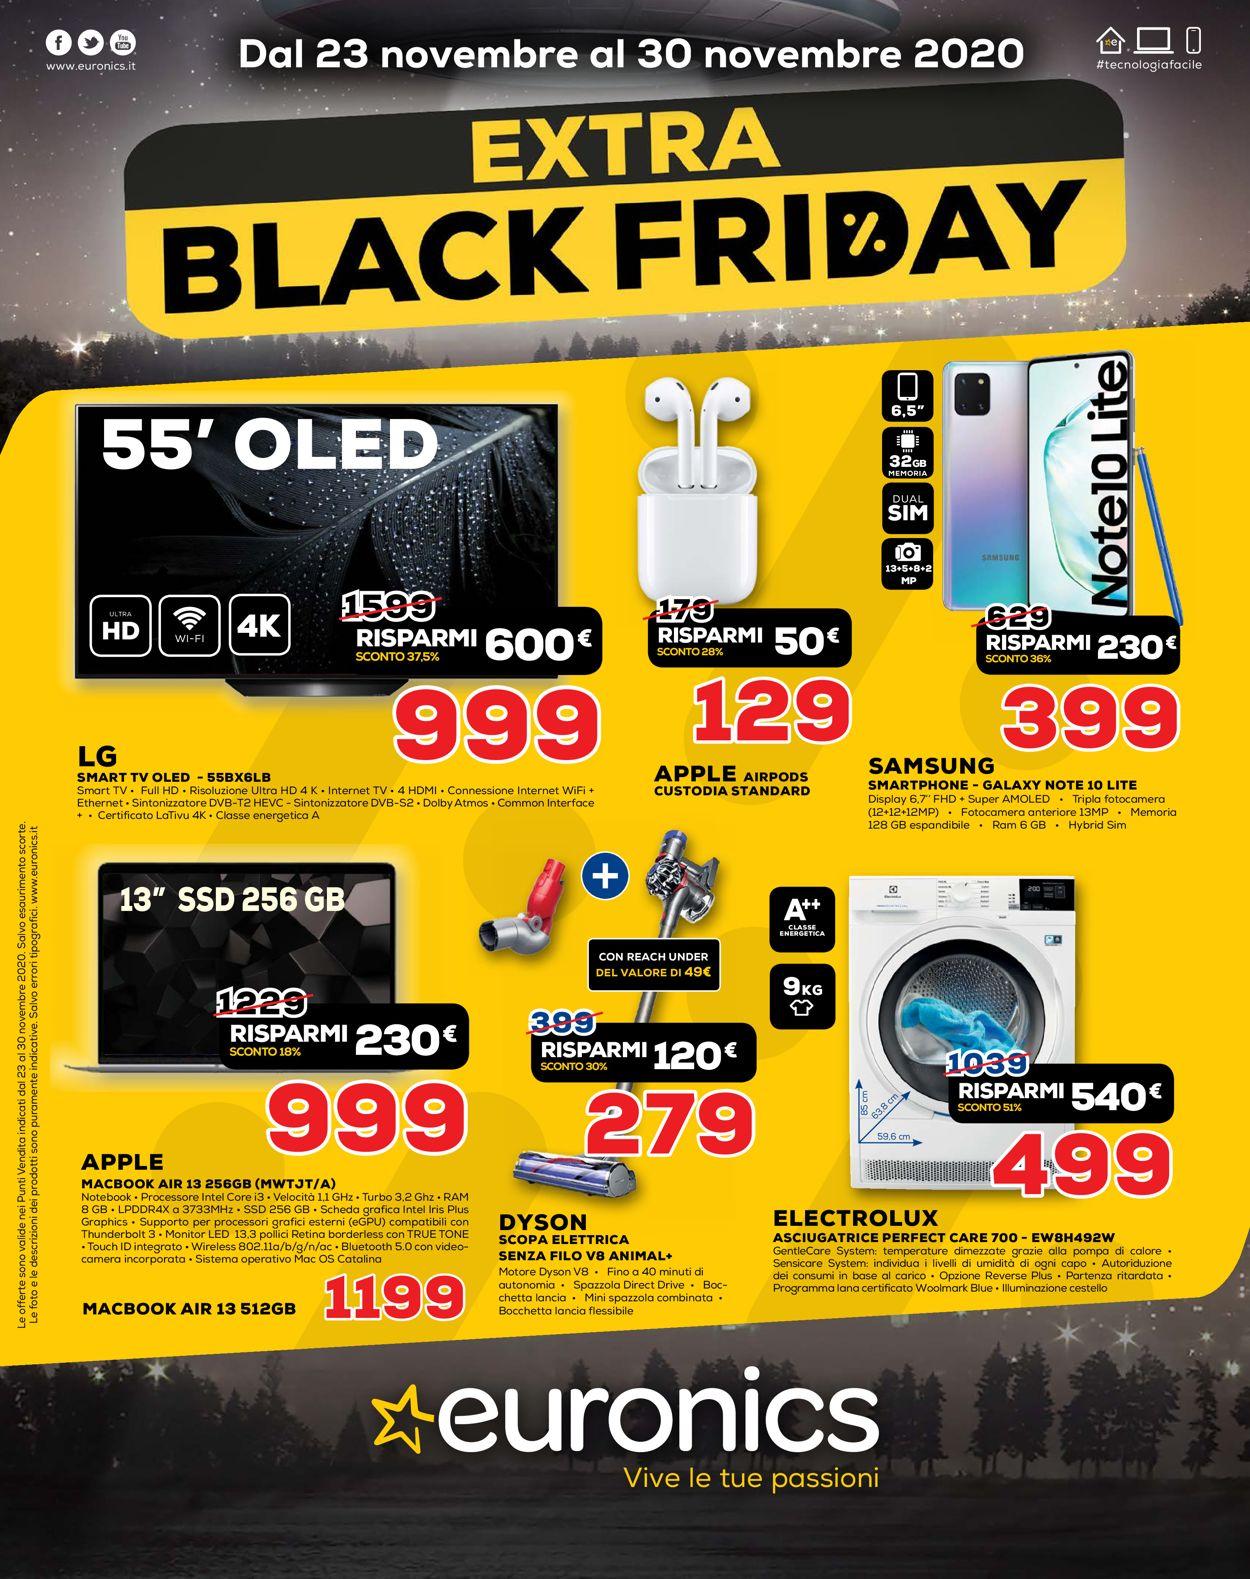 Volantino Euronics Black Friday 2020 - Offerte 23/11-30/11/2020